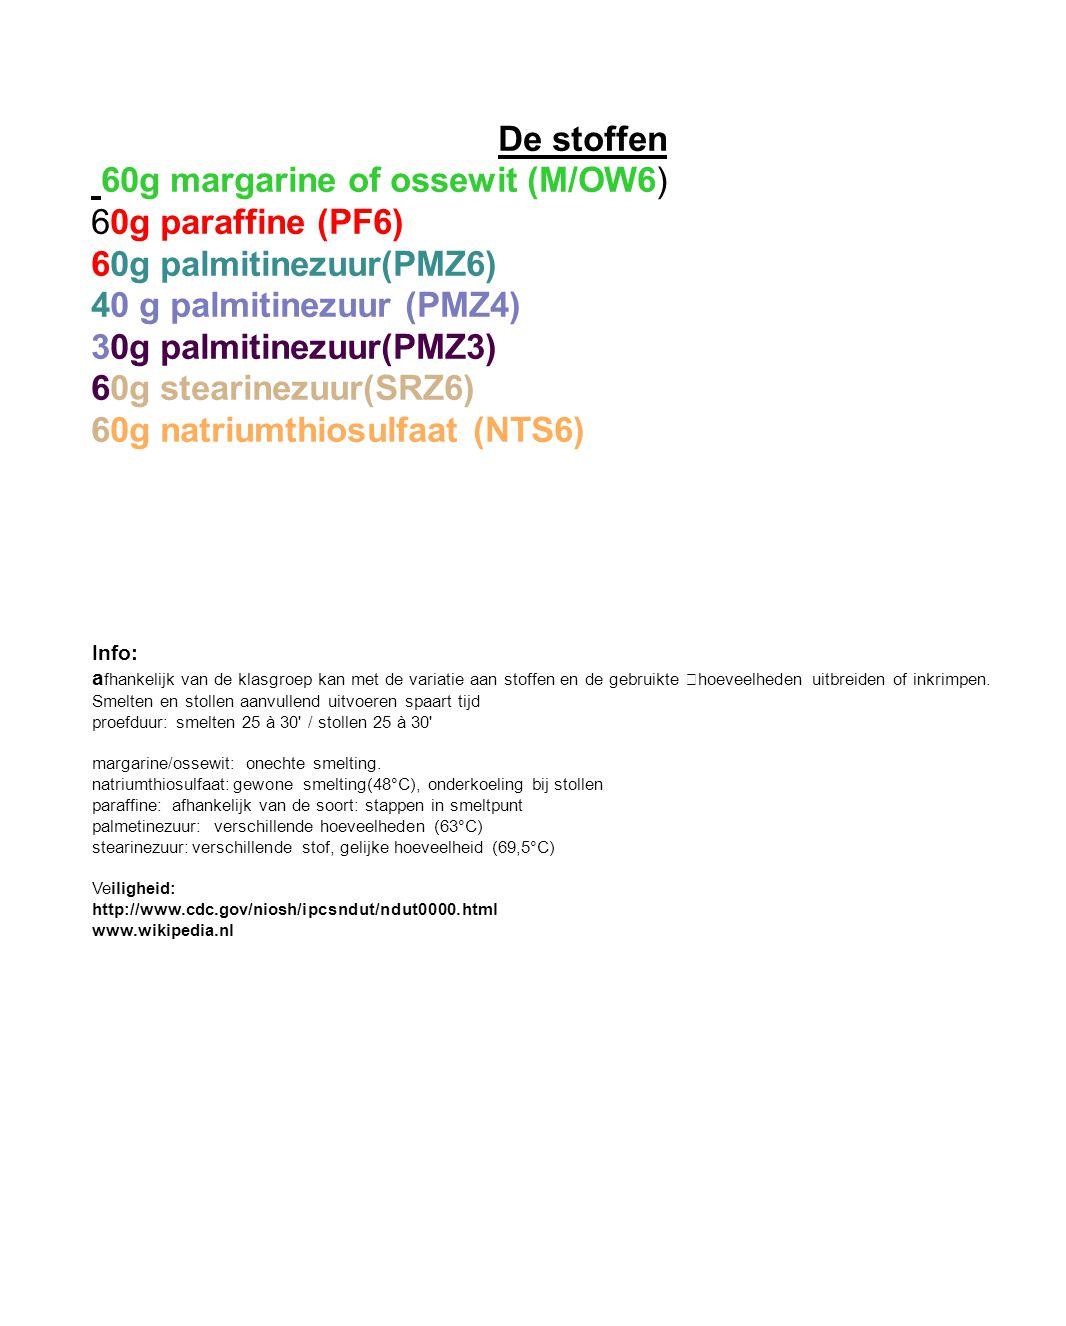 De stoffen 60g margarine of ossewit (M/OW6) 60g paraffine (PF6) 60g palmitinezuur(PMZ6) 40 g palmitinezuur (PMZ4) 30g palmitinezuur(PMZ3) 60g stearine